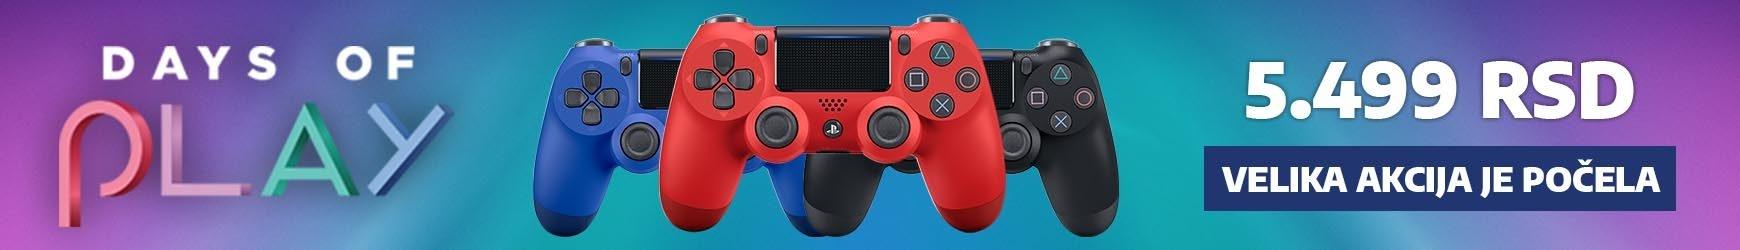 PS4 oprema